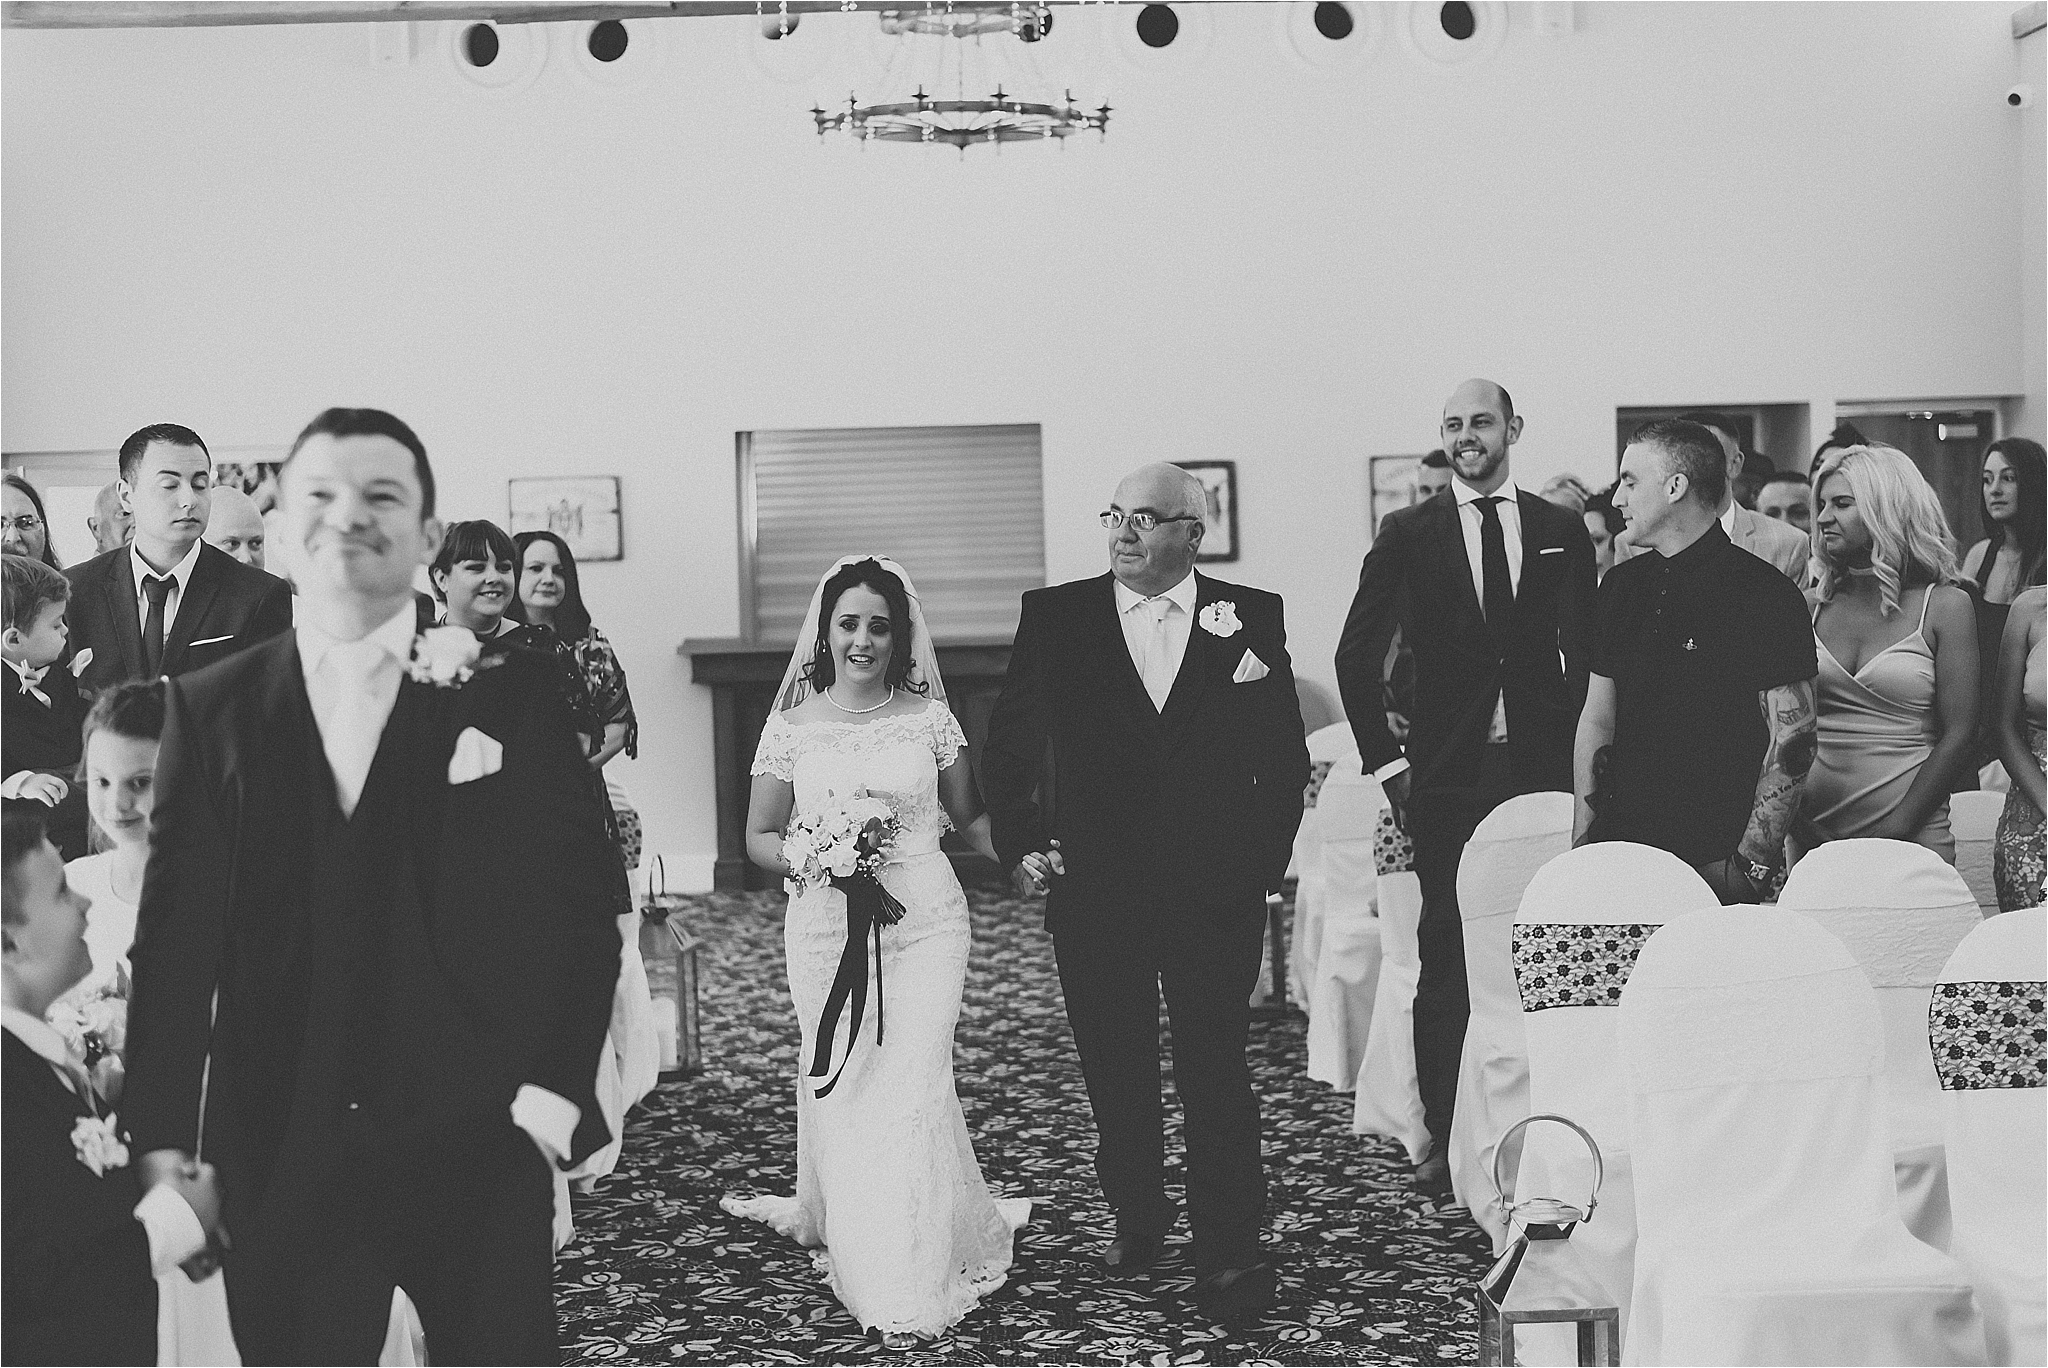 thevilla+lancashire+wreagreen+wedding+photographer23.jpg